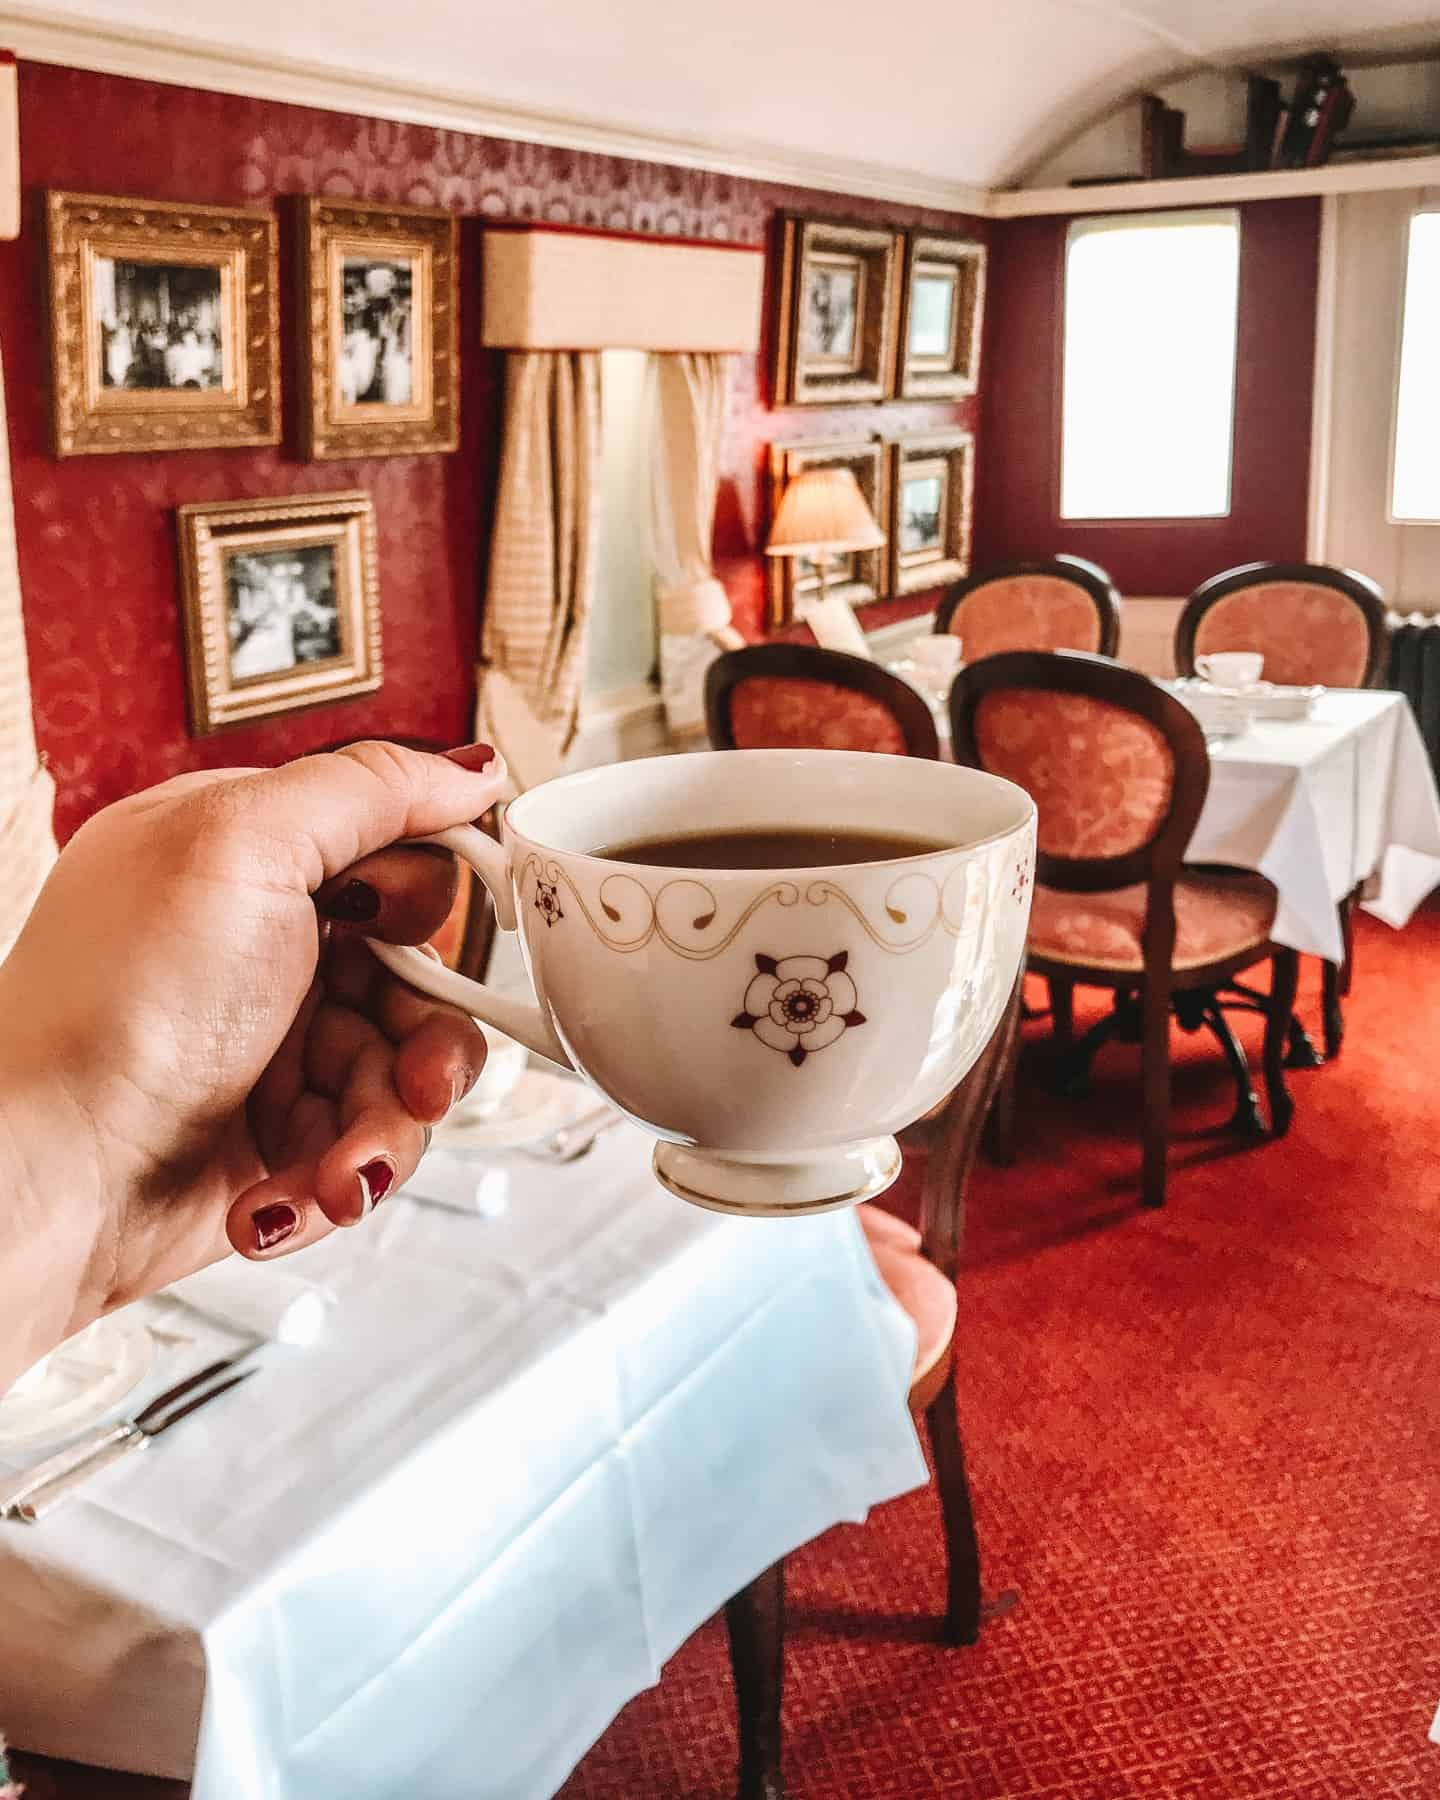 countess of york afternoon tea